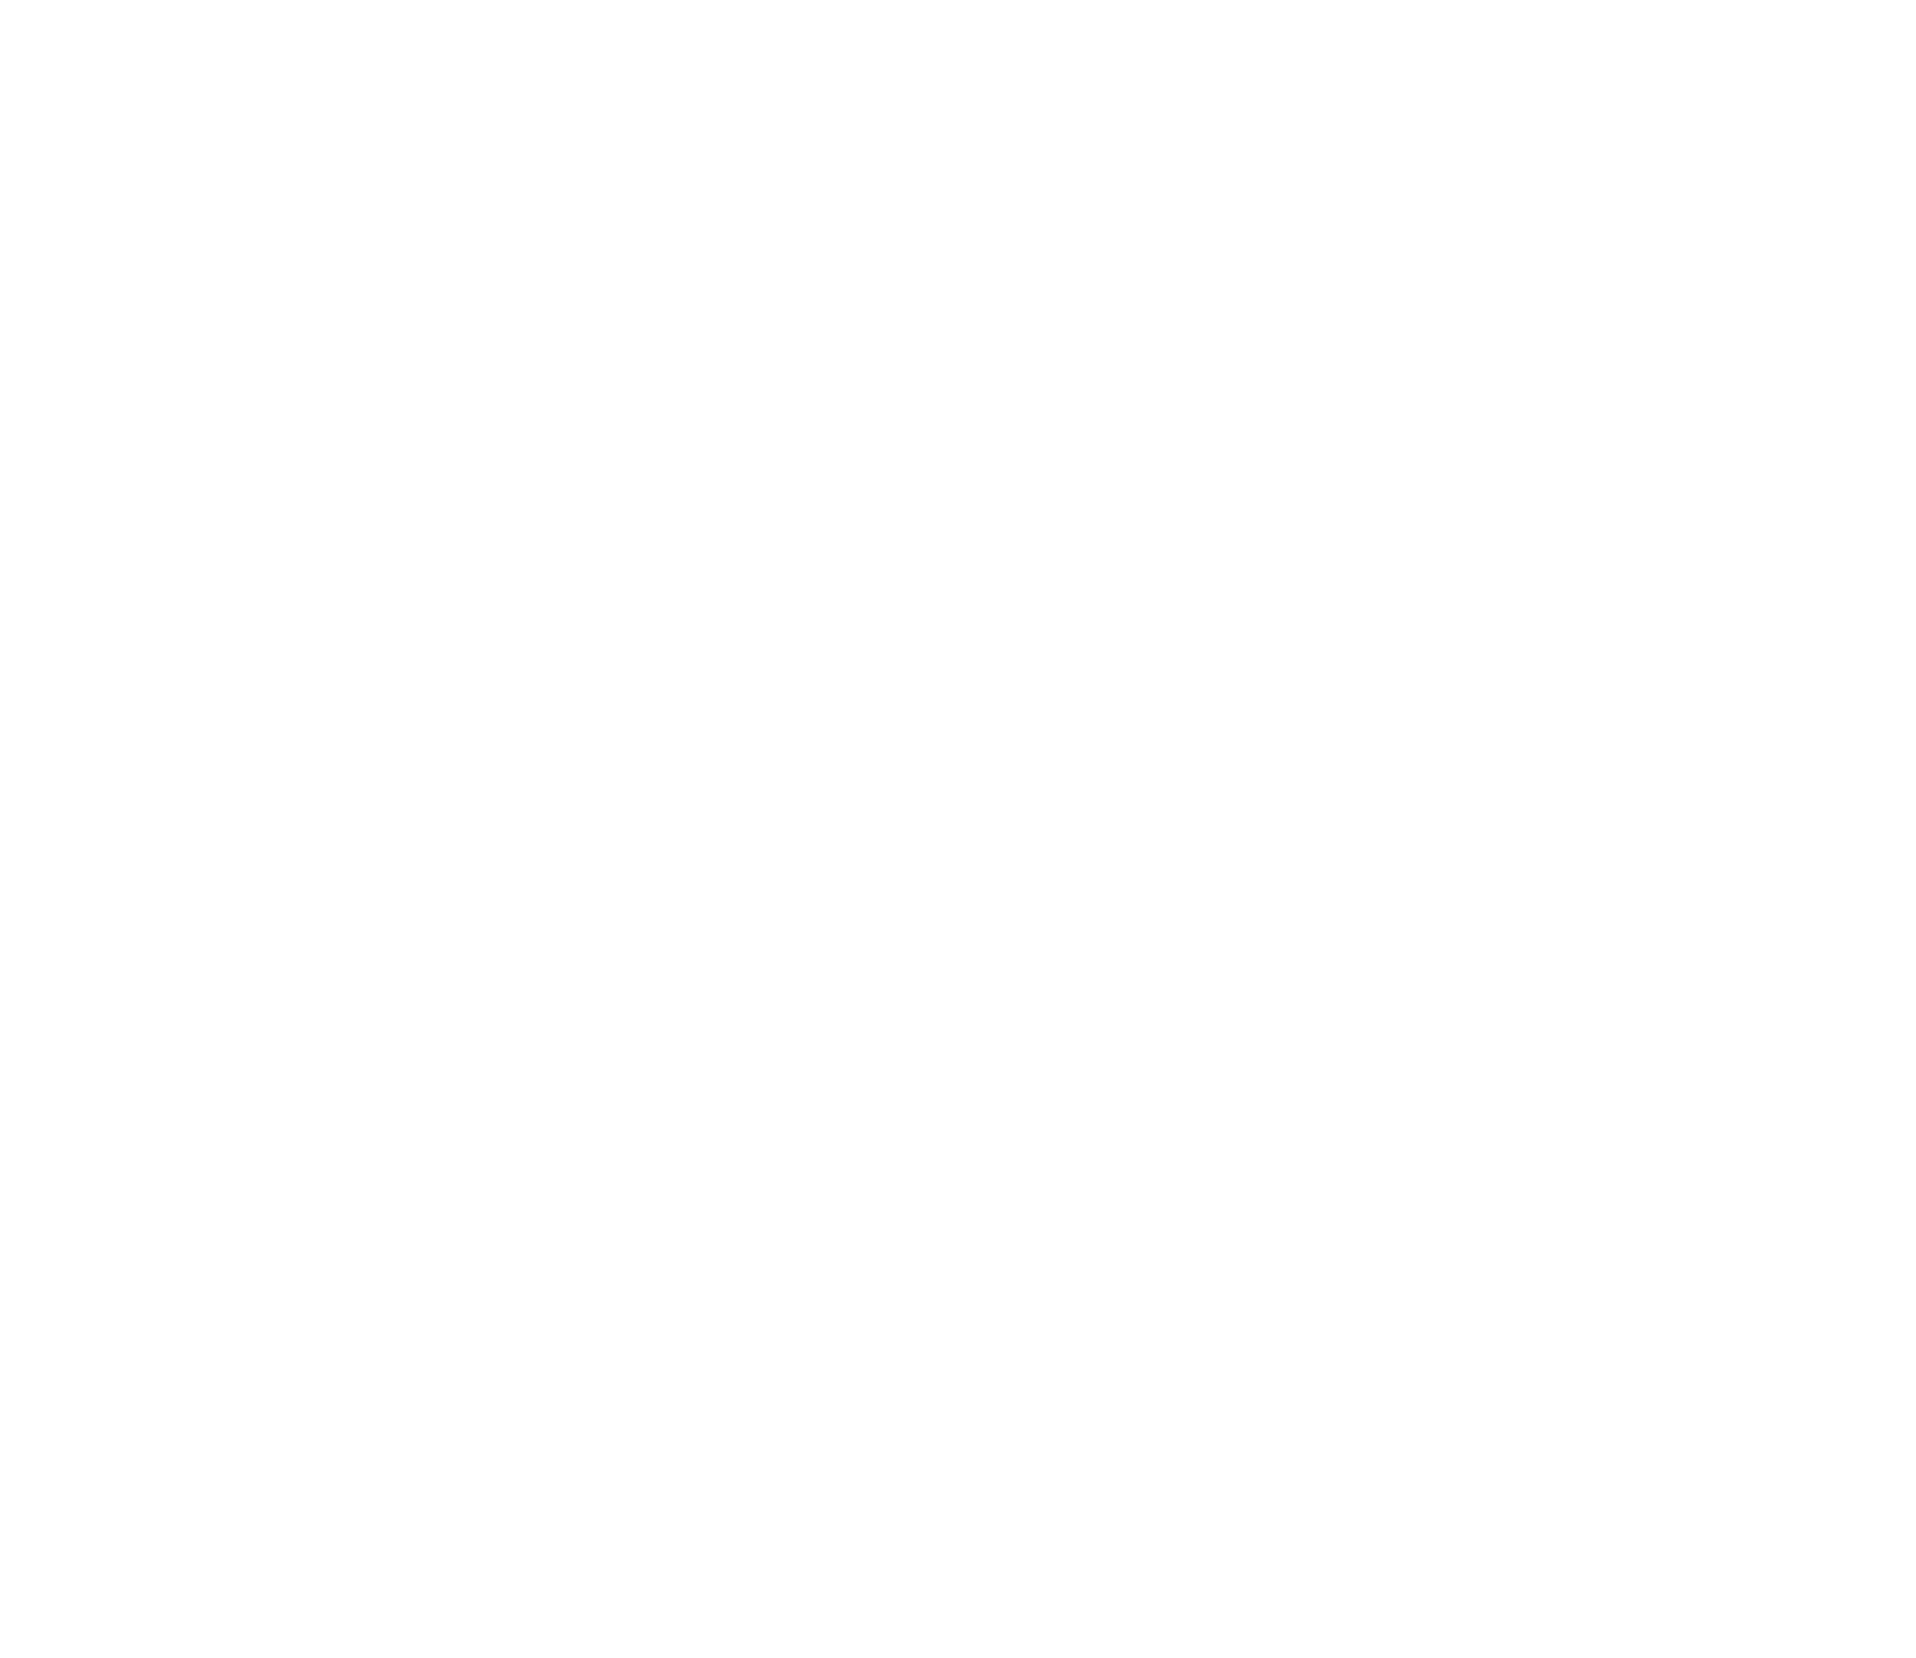 web icons_white-12